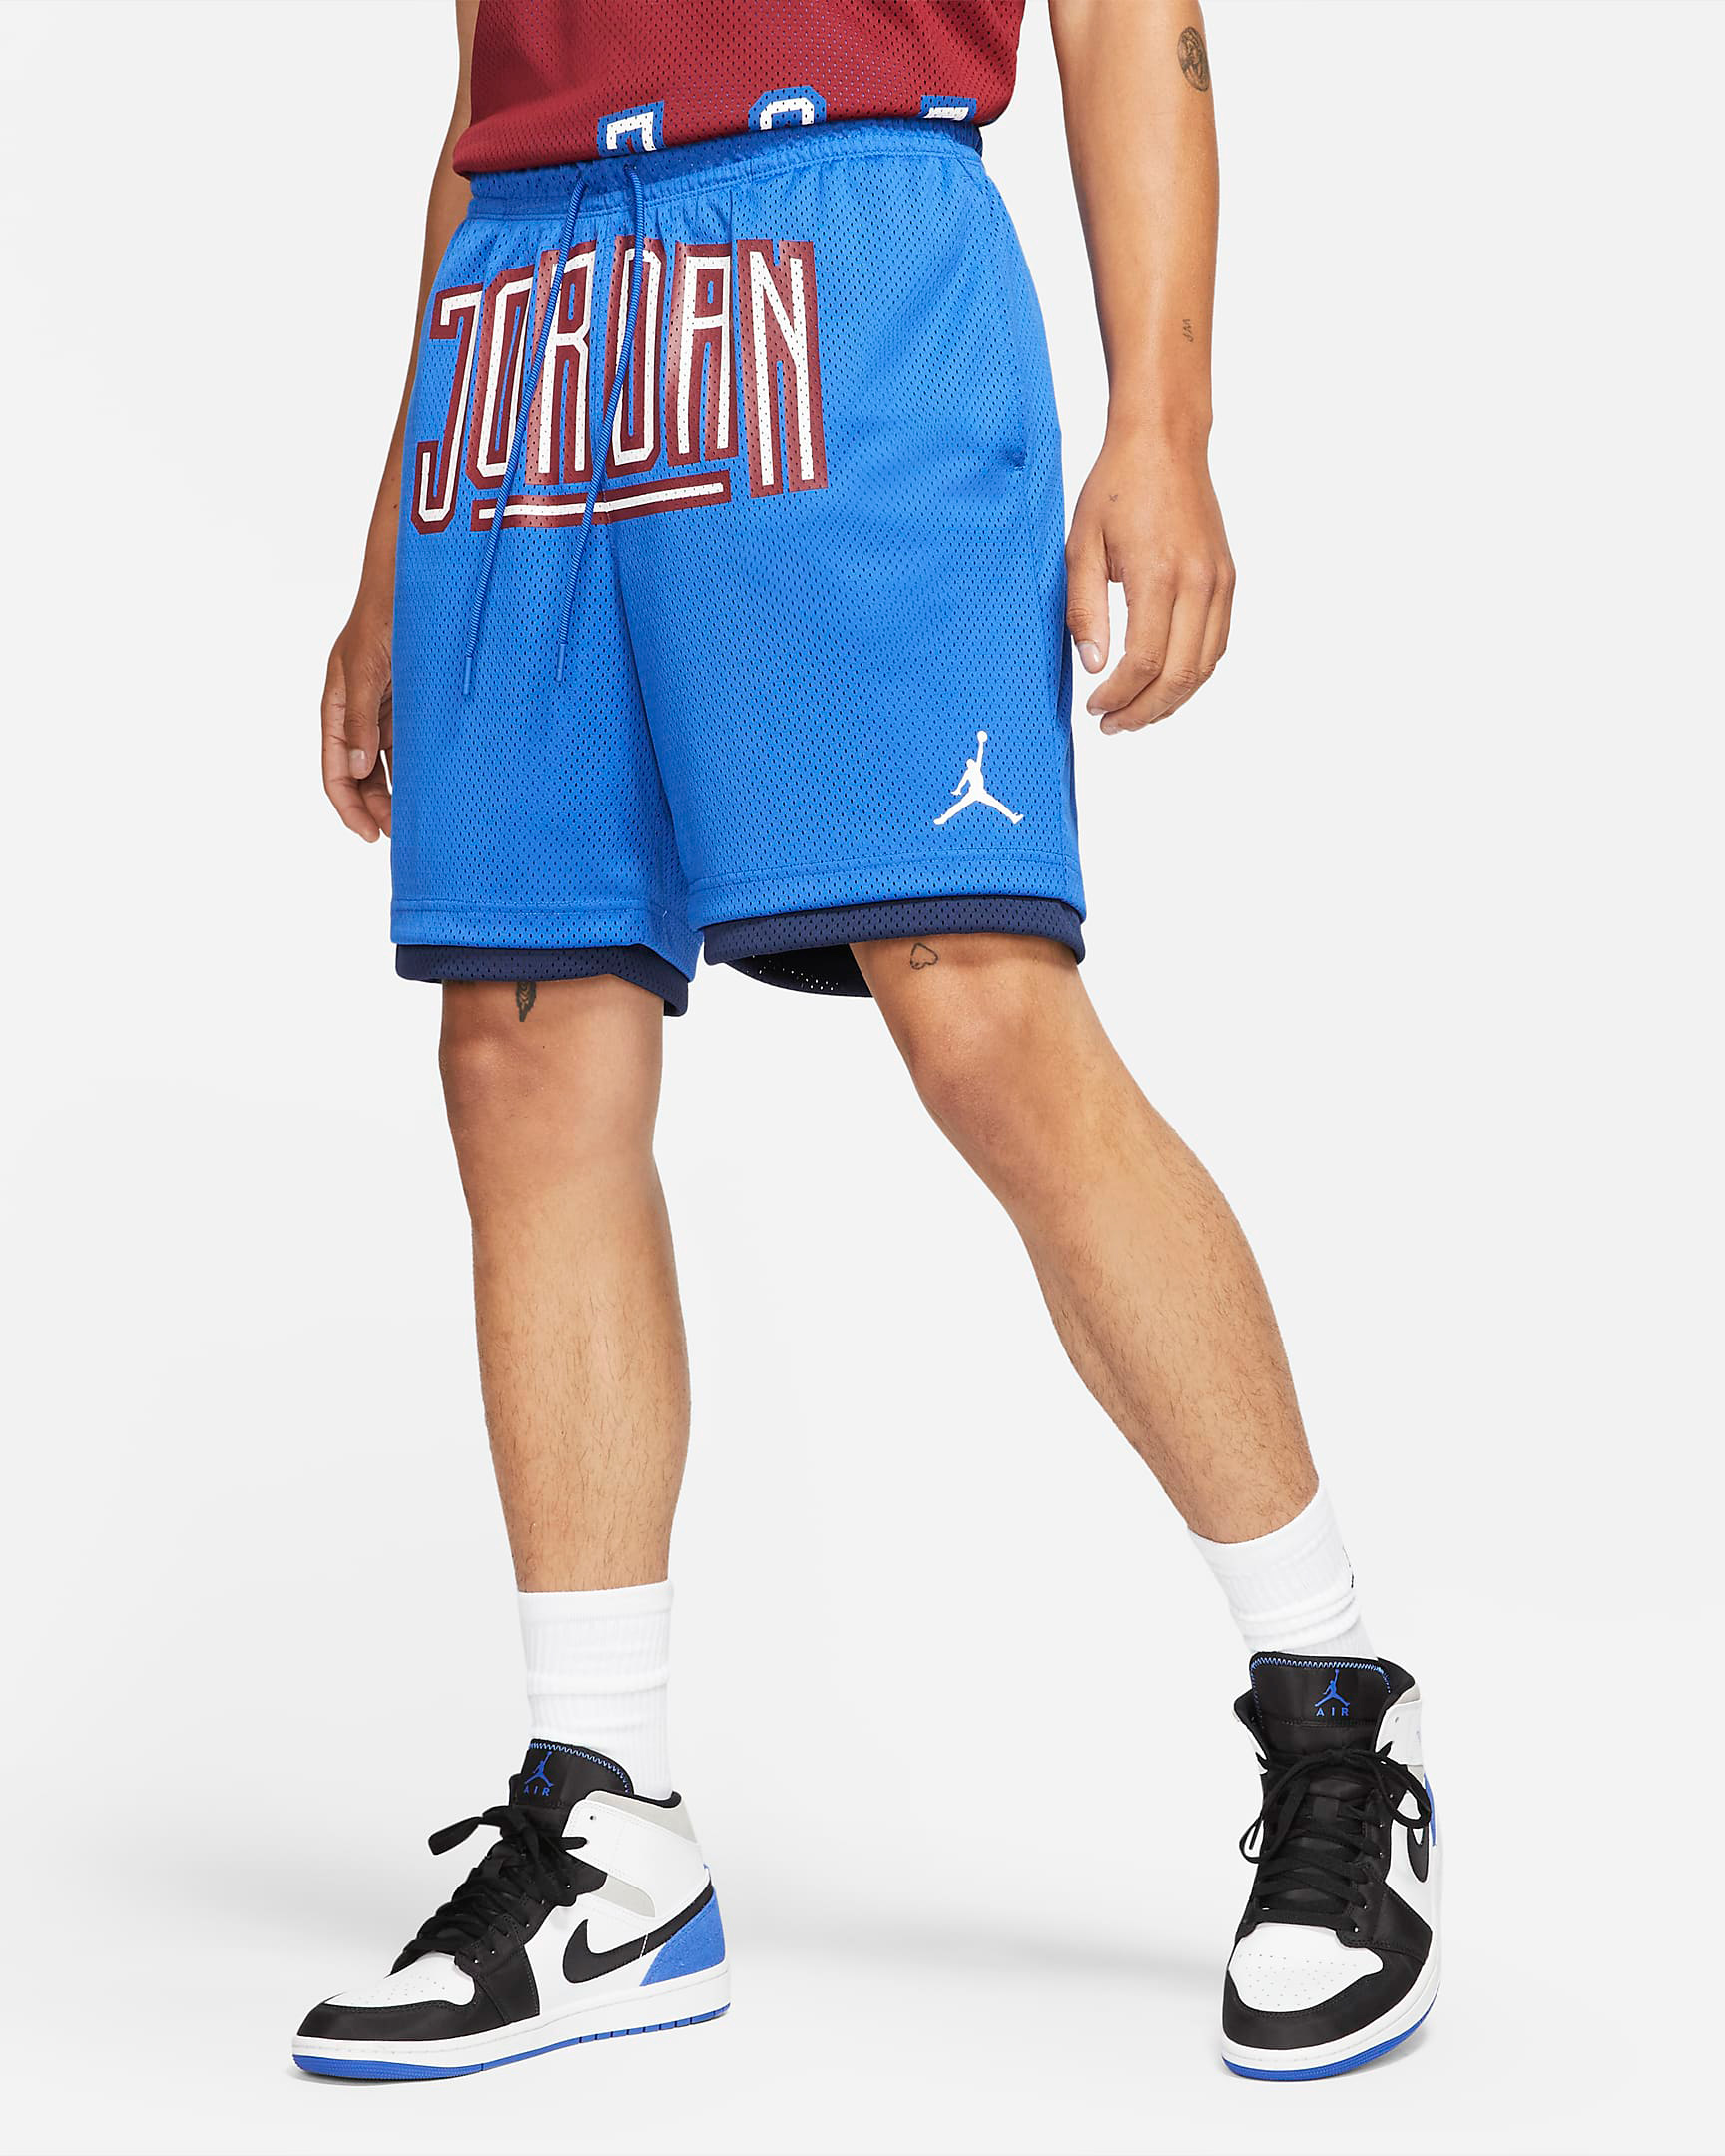 jordan-game-royal-sport-dna-shorts-1